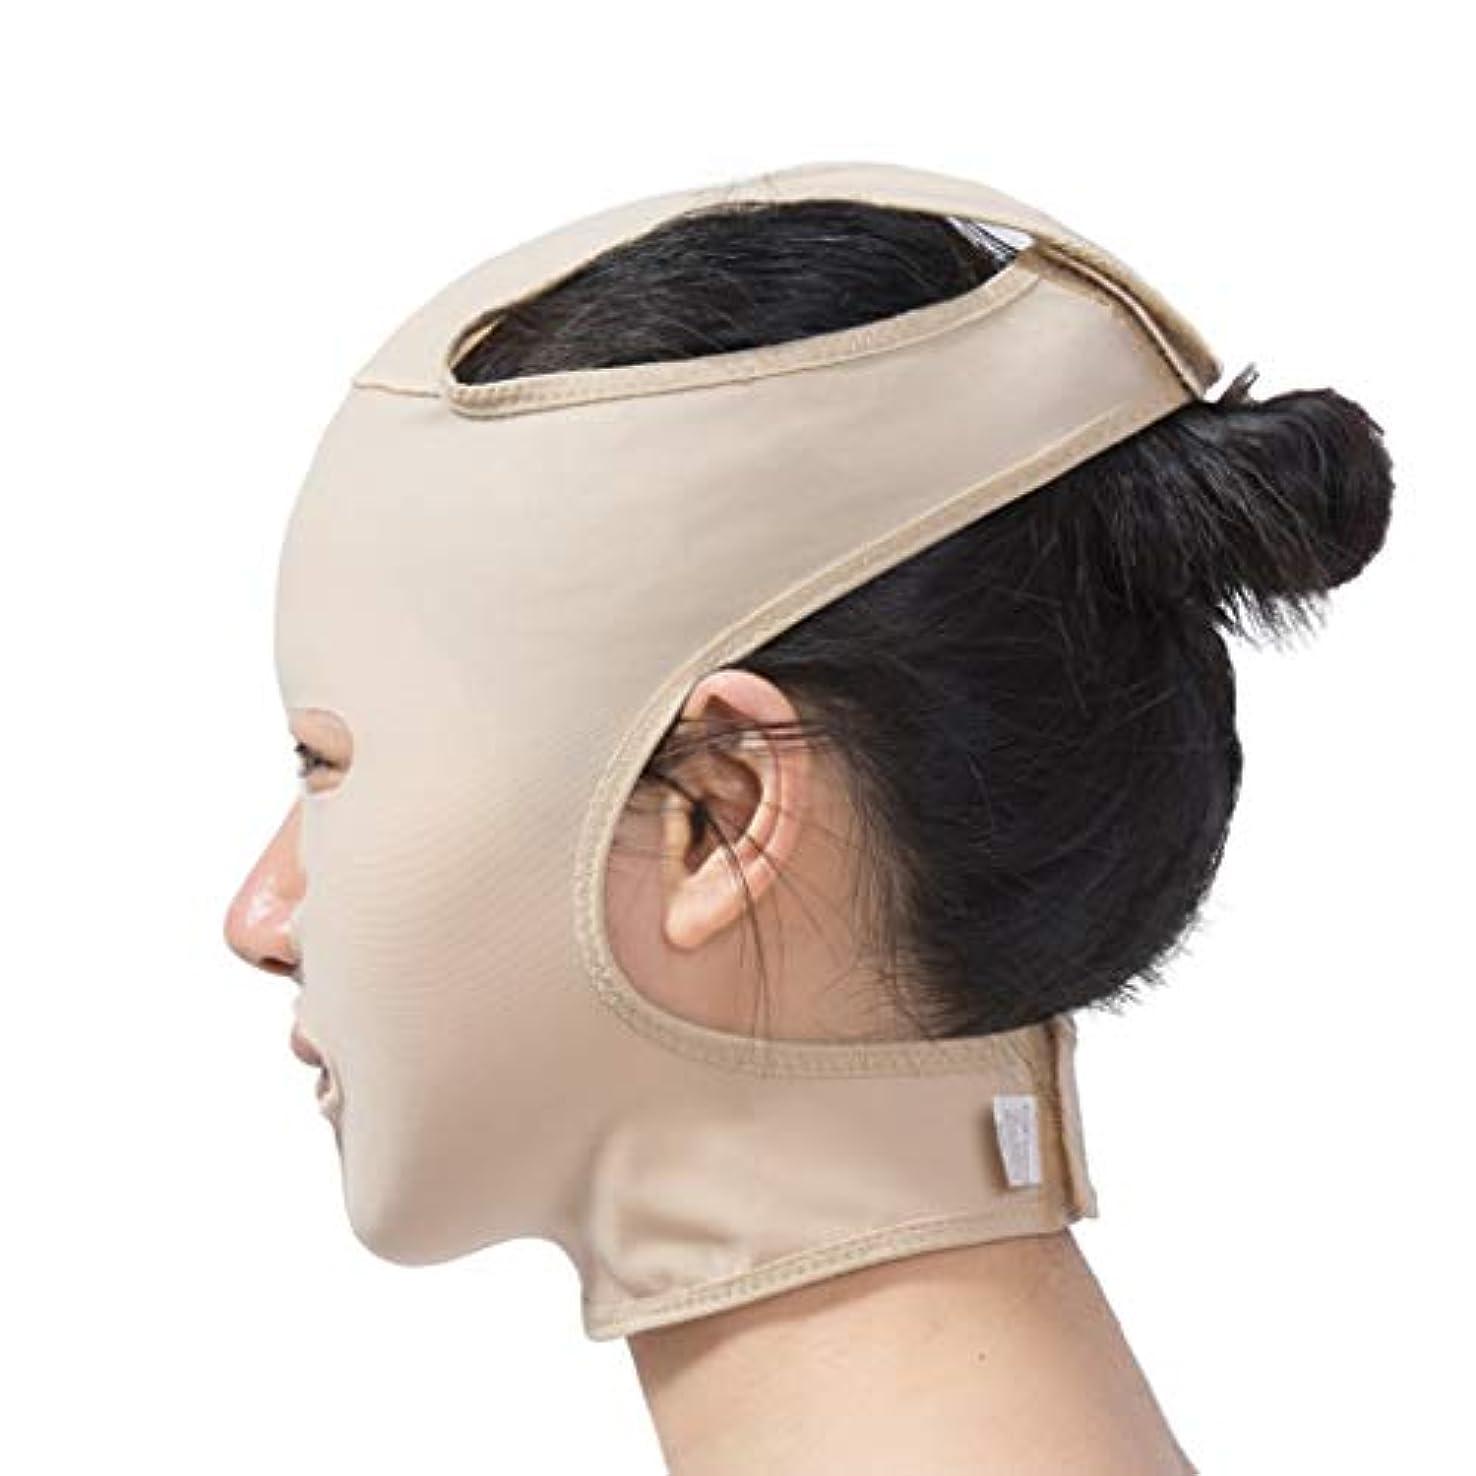 XHLMRMJ フェイスリフトマスク、フルフェイスマスク医療グレード圧力フェイスダブルチンプラスチック脂肪吸引術弾性包帯ヘッドギア後の顔の脂肪吸引術 (Size : XL)